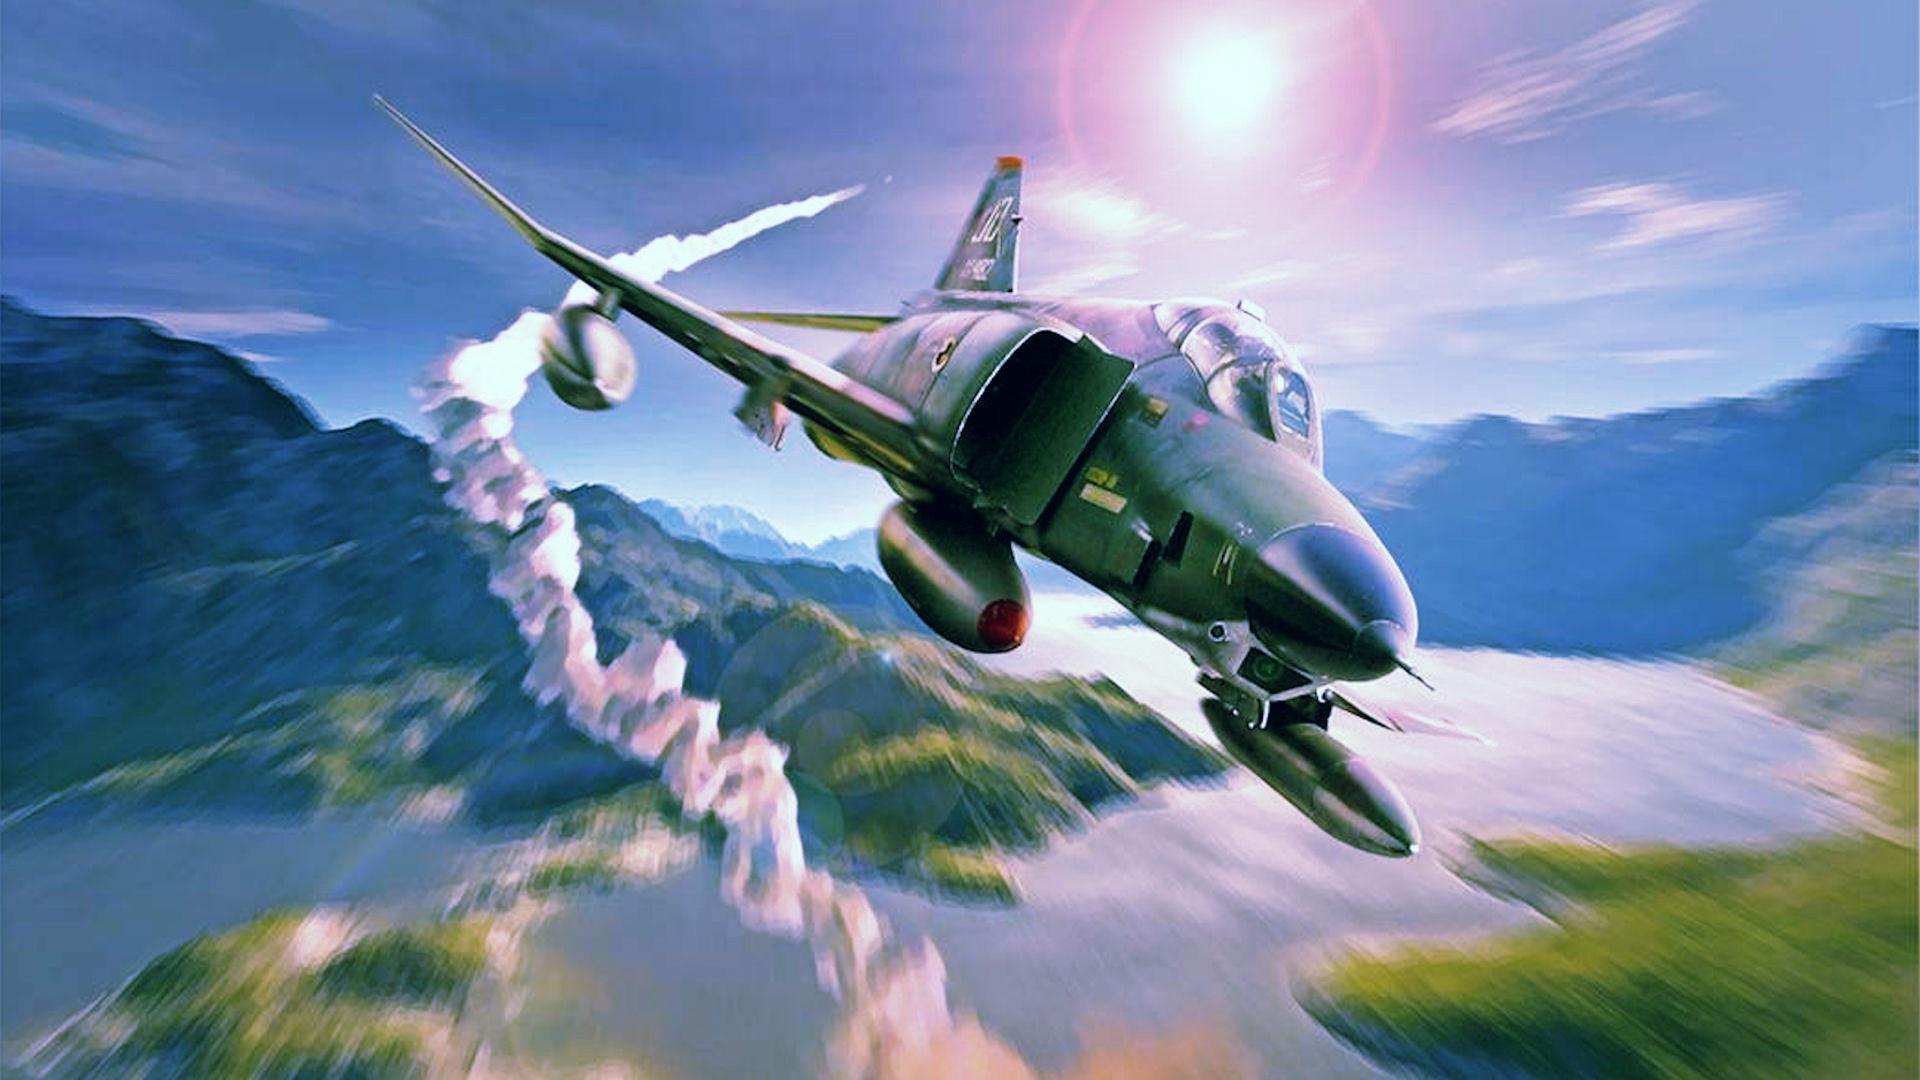 Avb harrier jet aircraft fighter jets military wallpaper rh